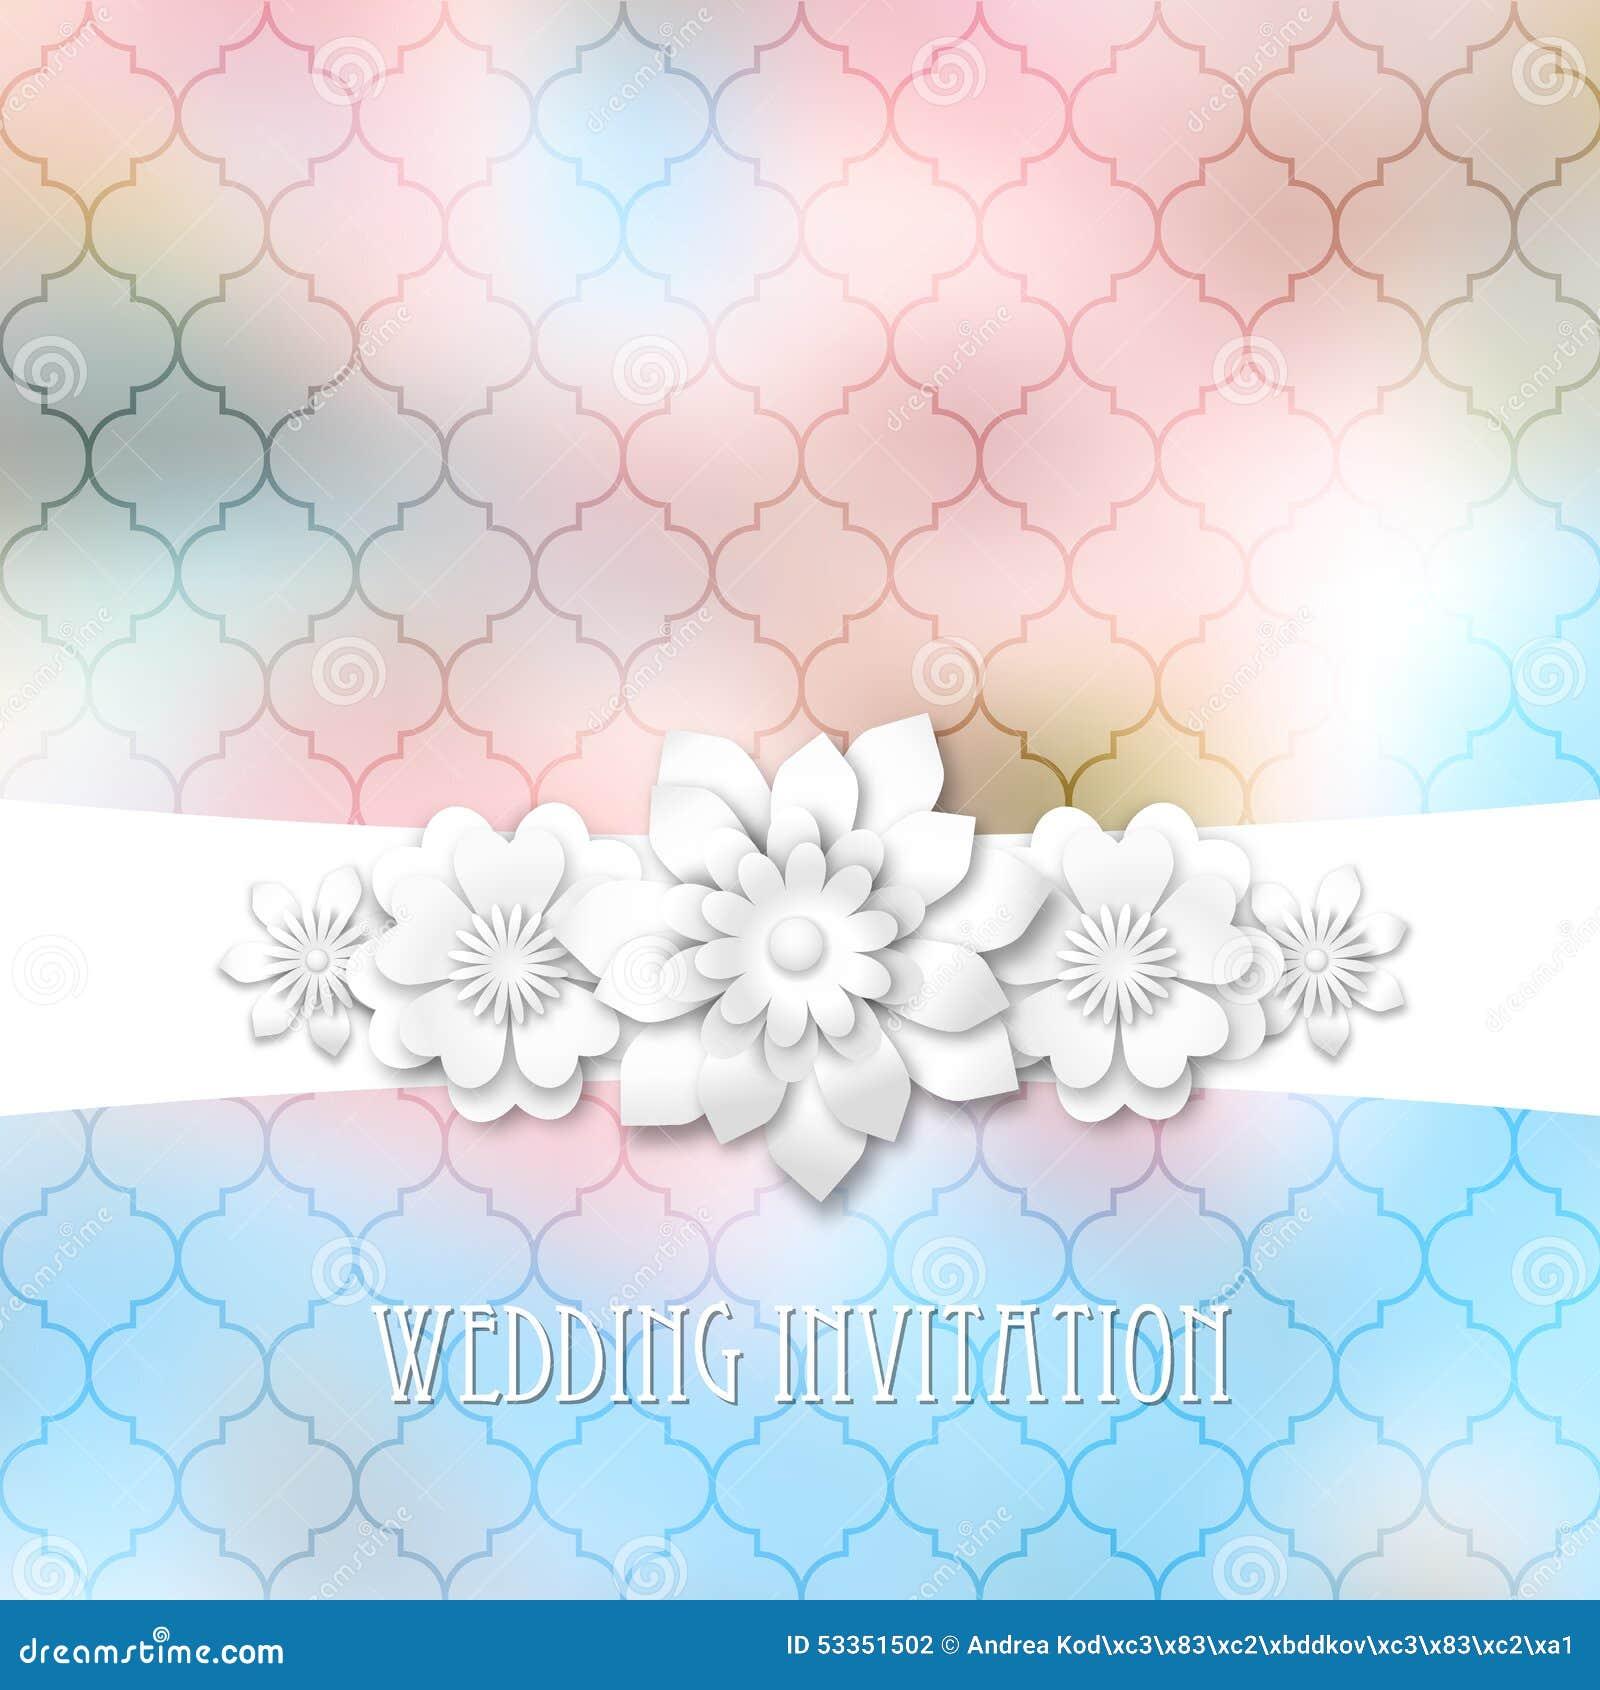 Bokeh Flowers Wedding: Wedding Invitation Stock Vector